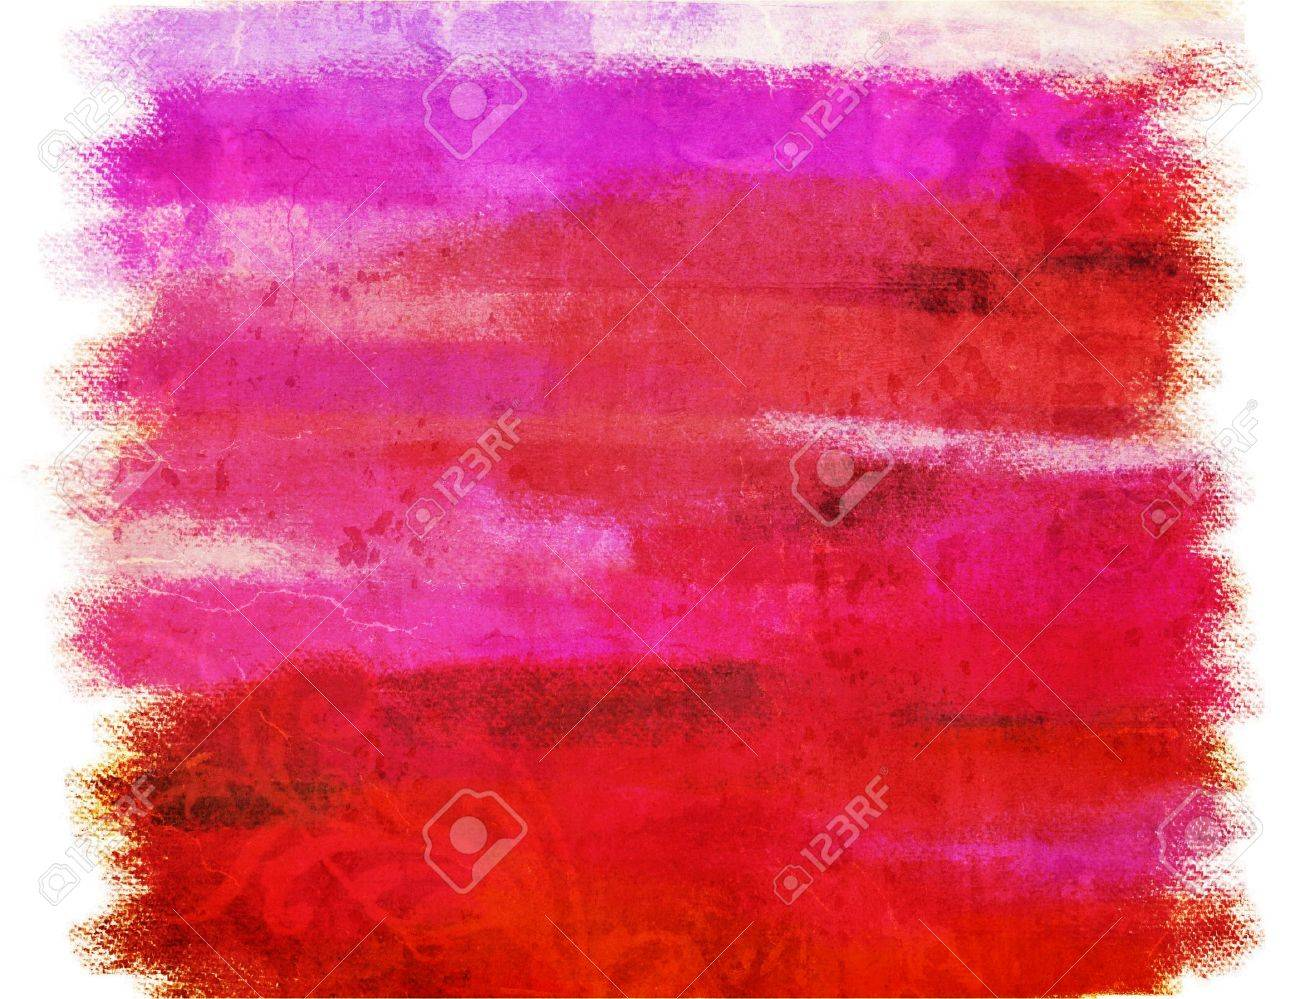 Art grunge vintage red texture background Stock Photo - 18320459